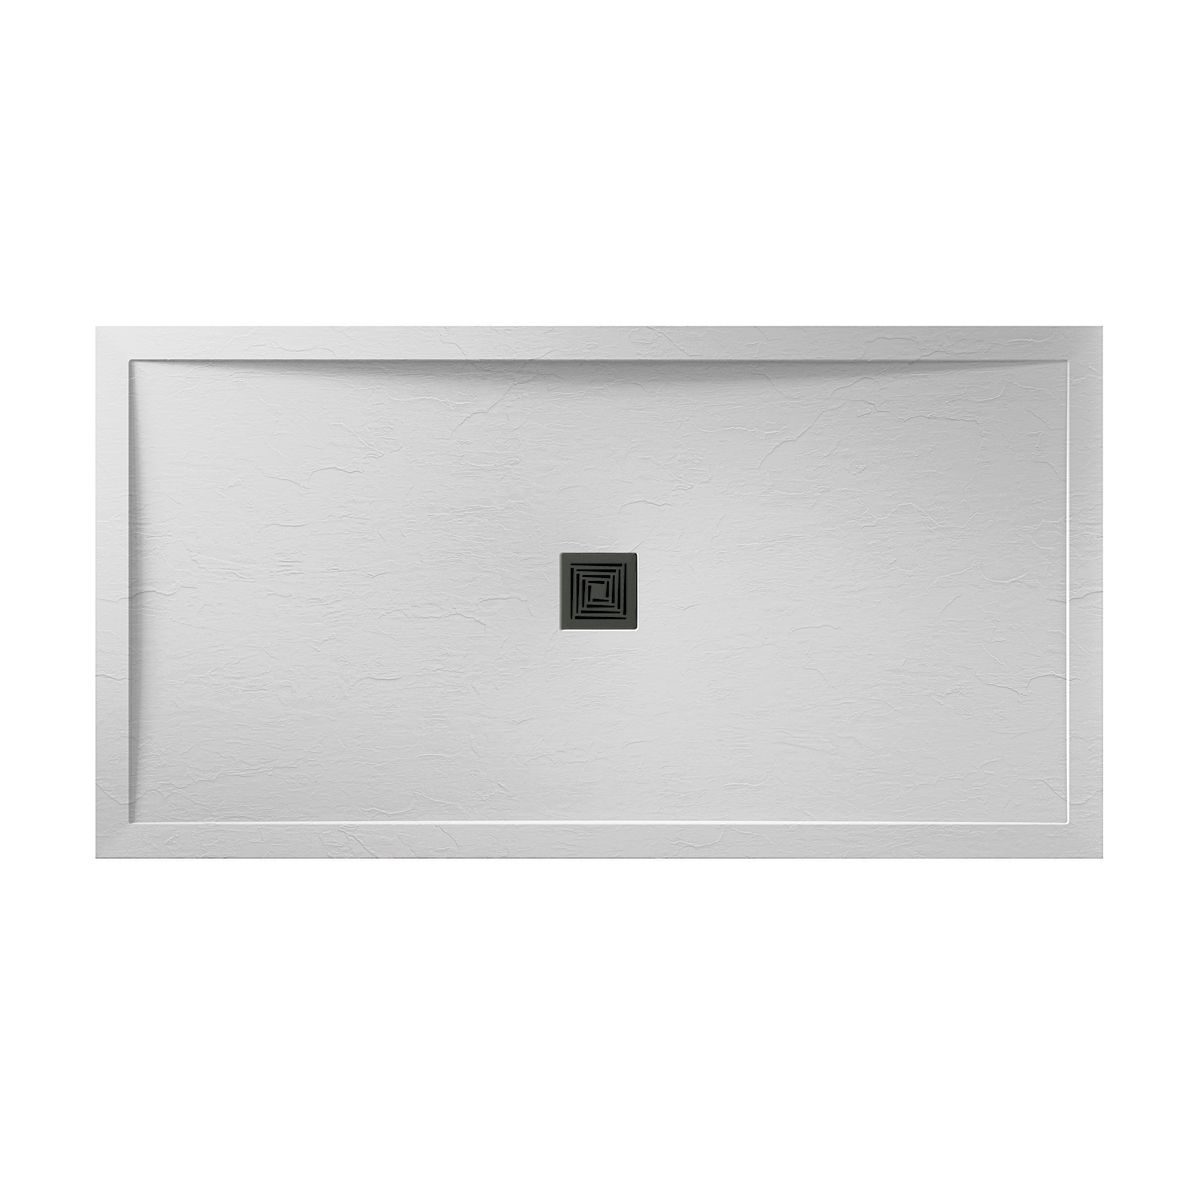 Aquadart White Slate Shower Tray 1500 x 700